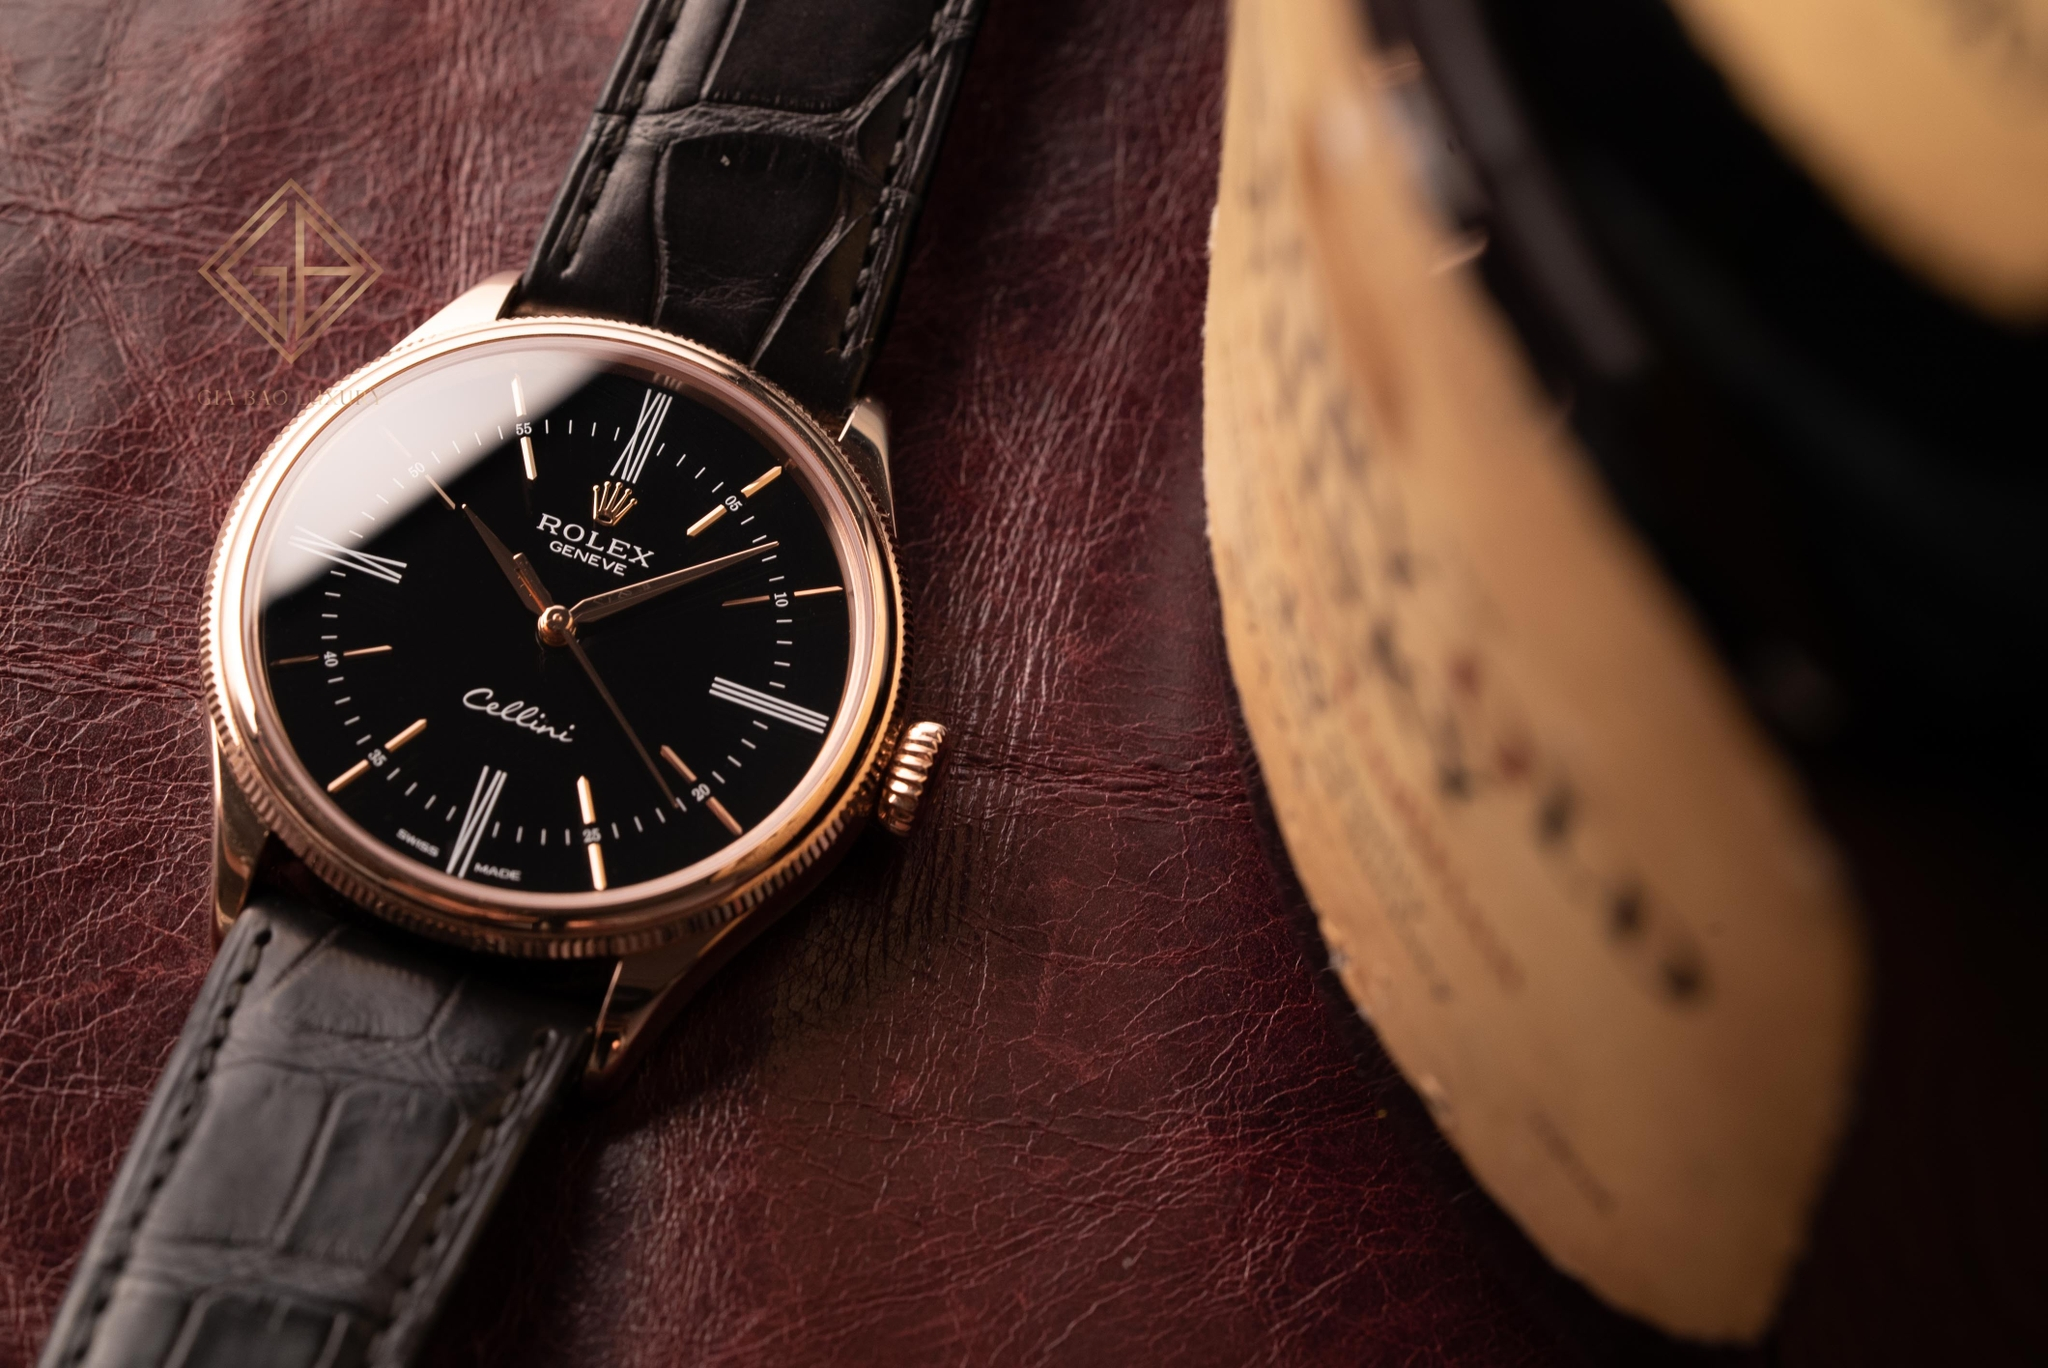 Đồng Hồ Rolex Cellini Time 50505 Mặt Số Đen